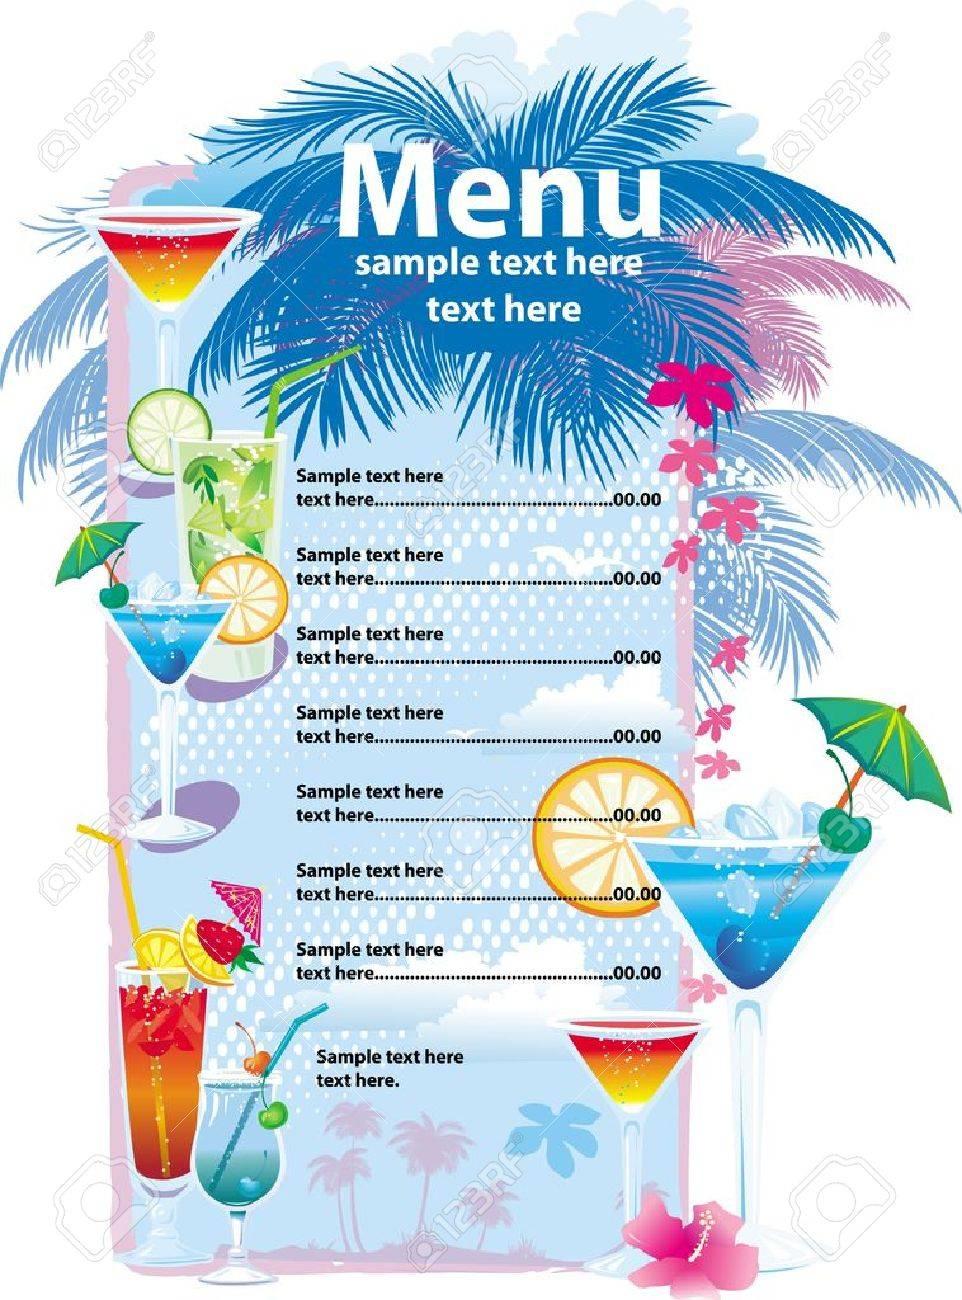 Template designs of cocktail menu - 9668933